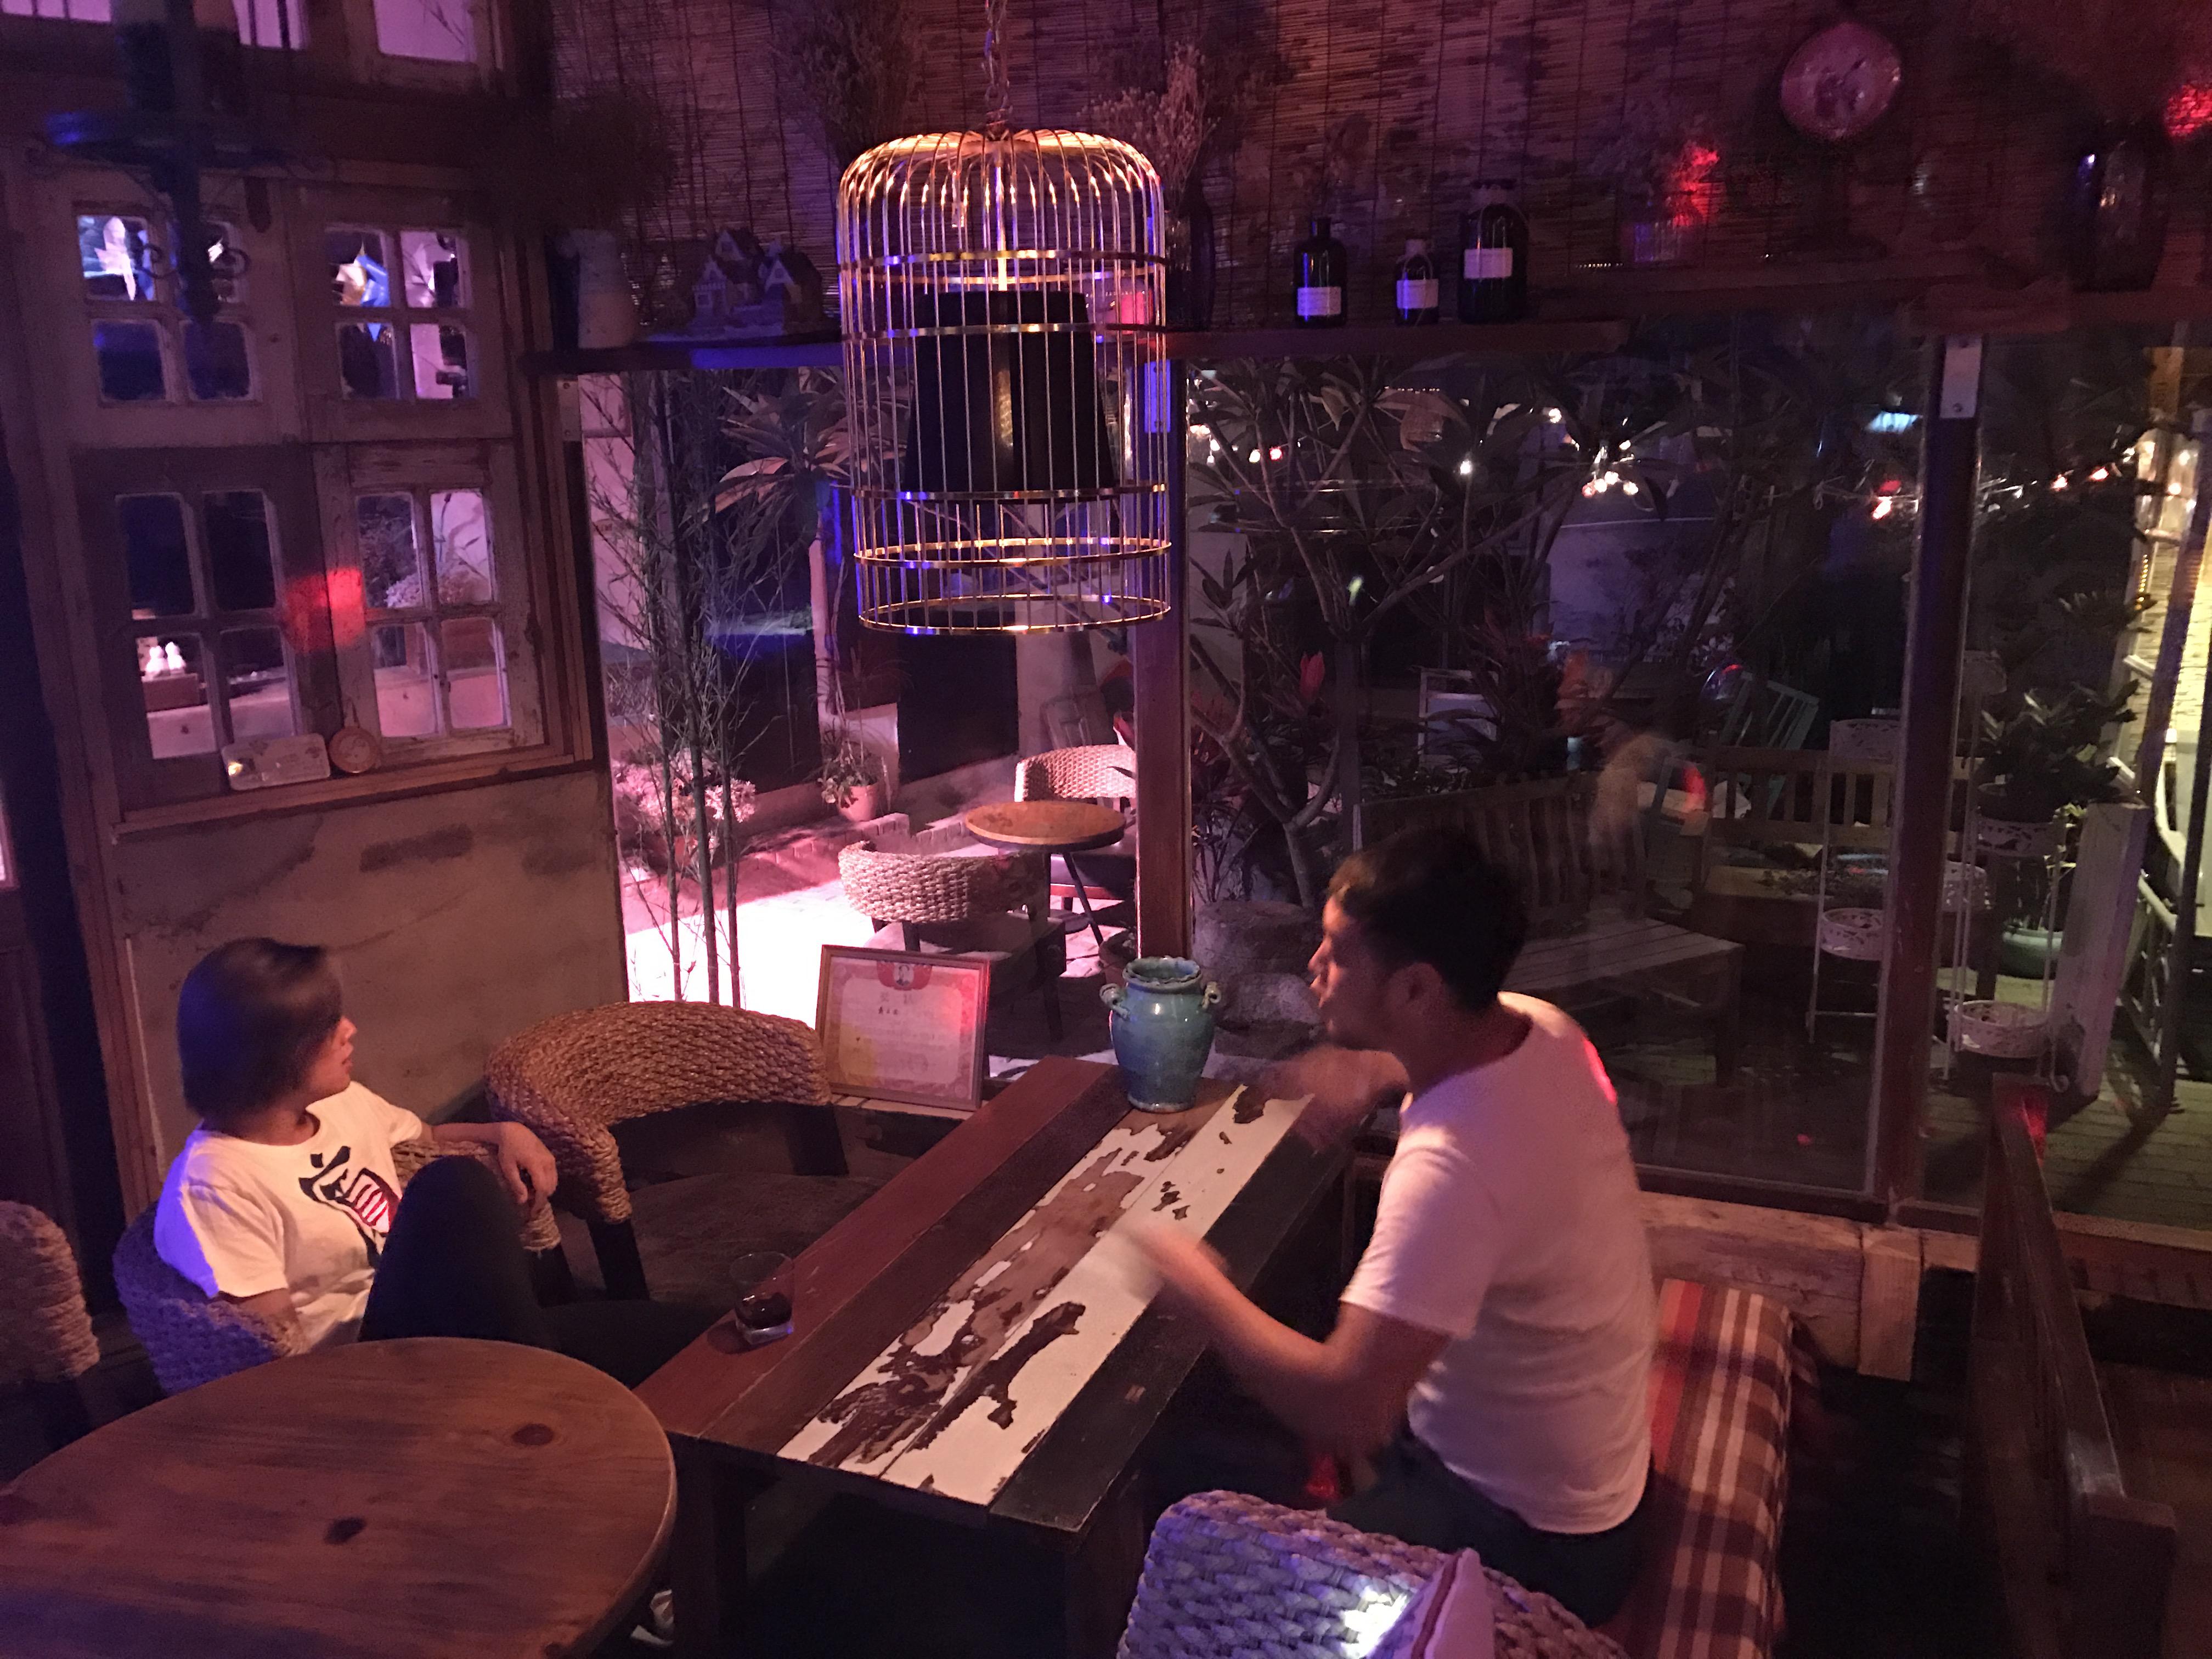 Miracle Paradise Bar & Gift Shop (Xi Wu 隙屋)